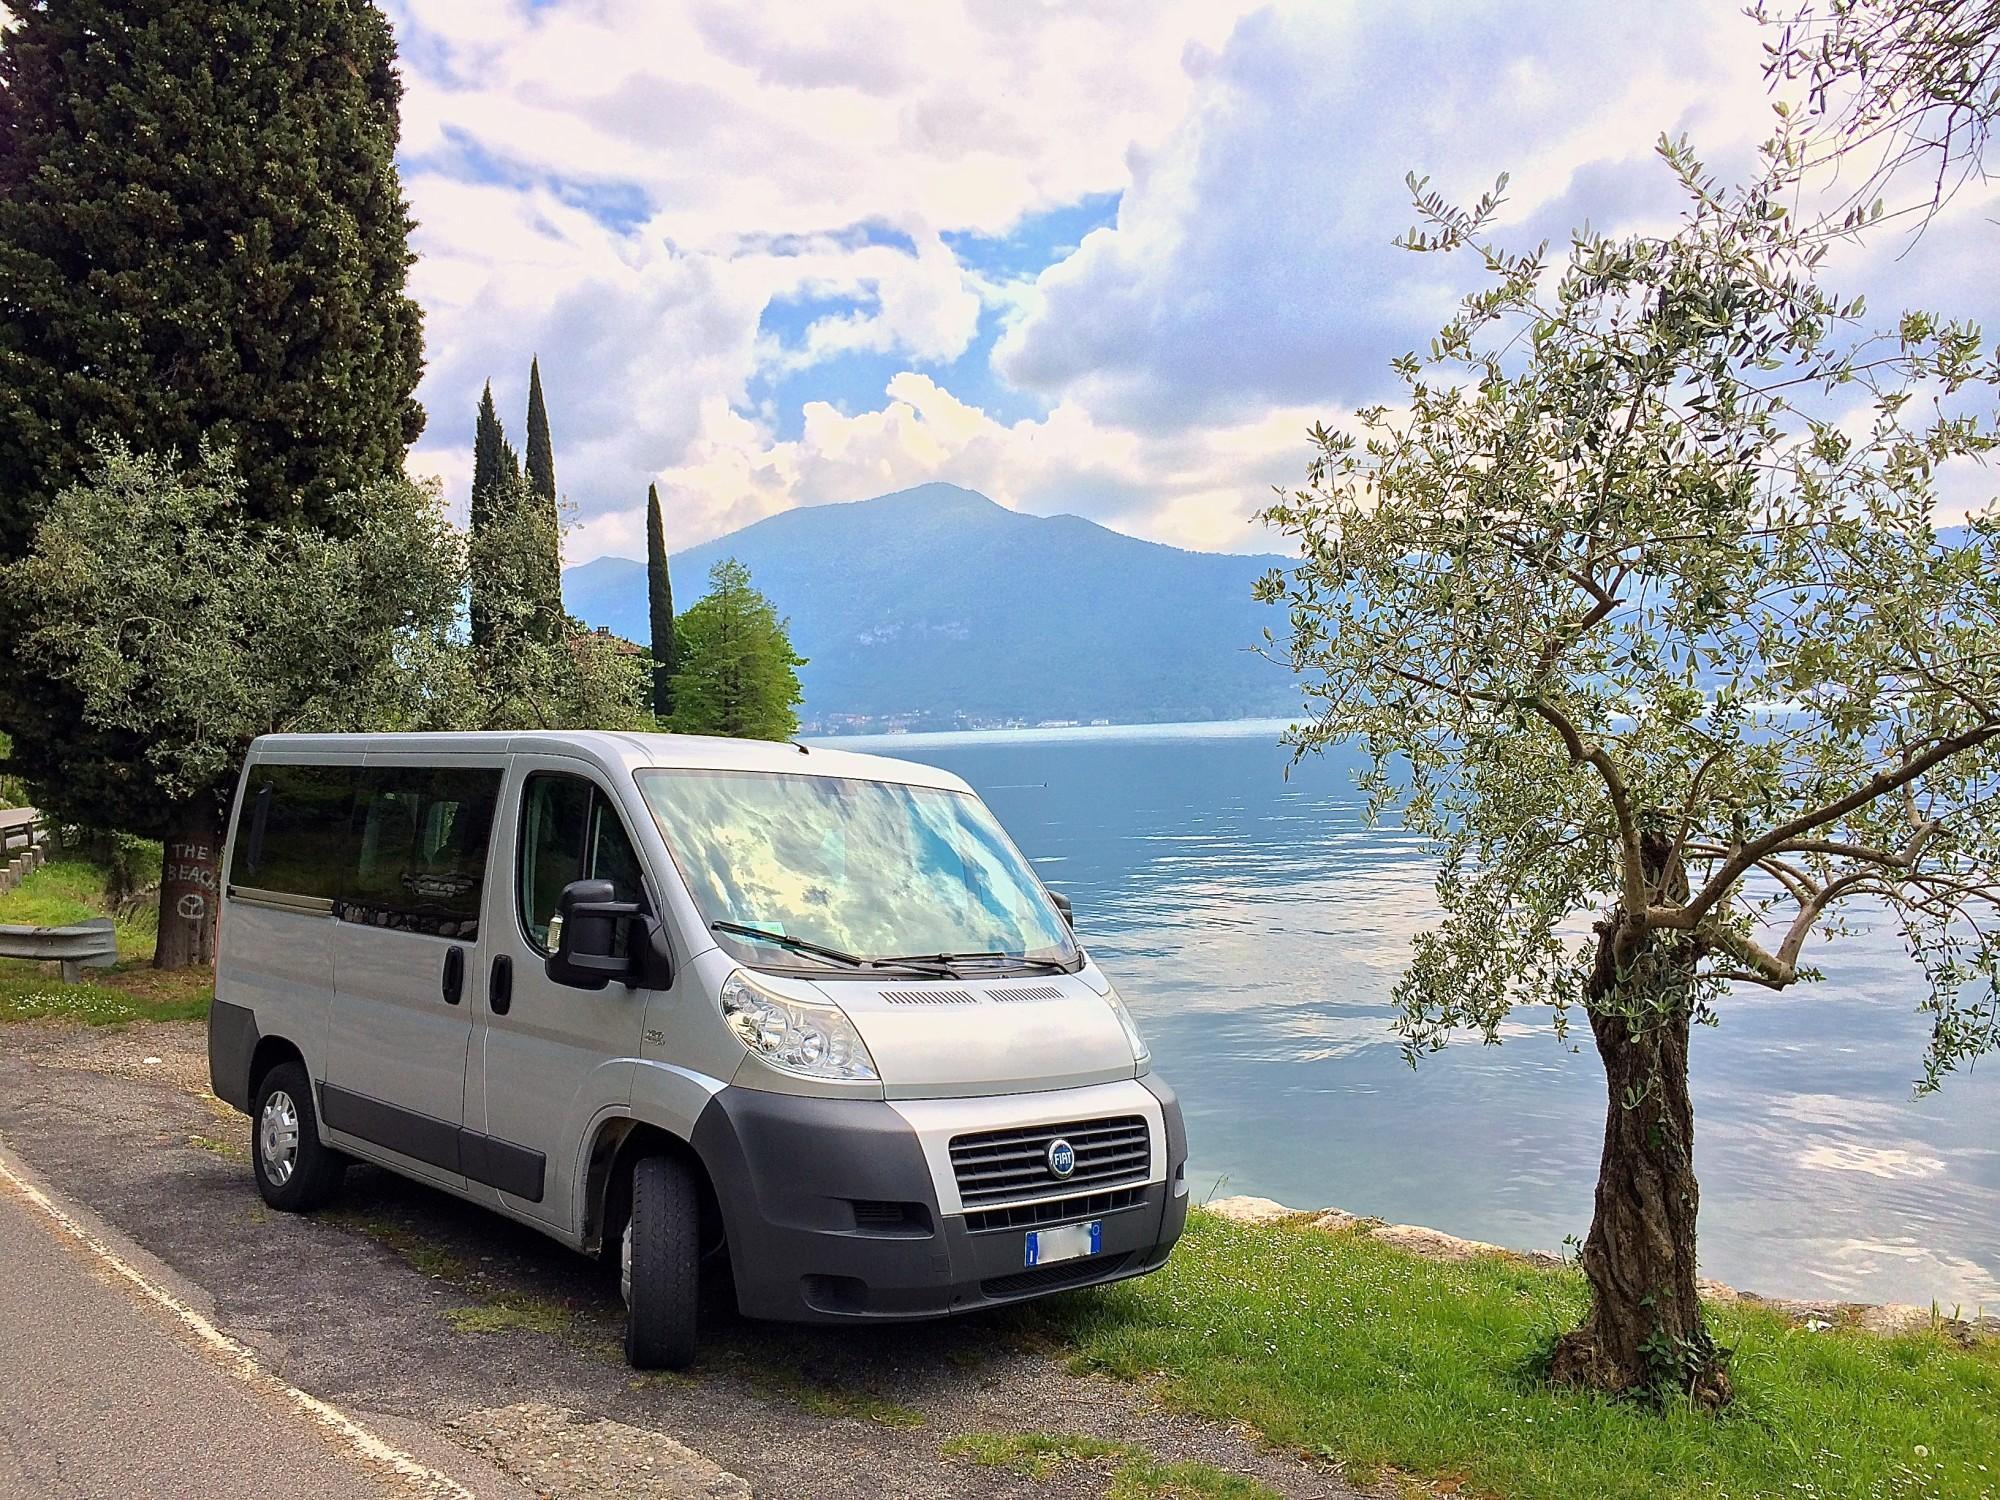 Iris Limousine - Noleggio Pulmino Con Conducente